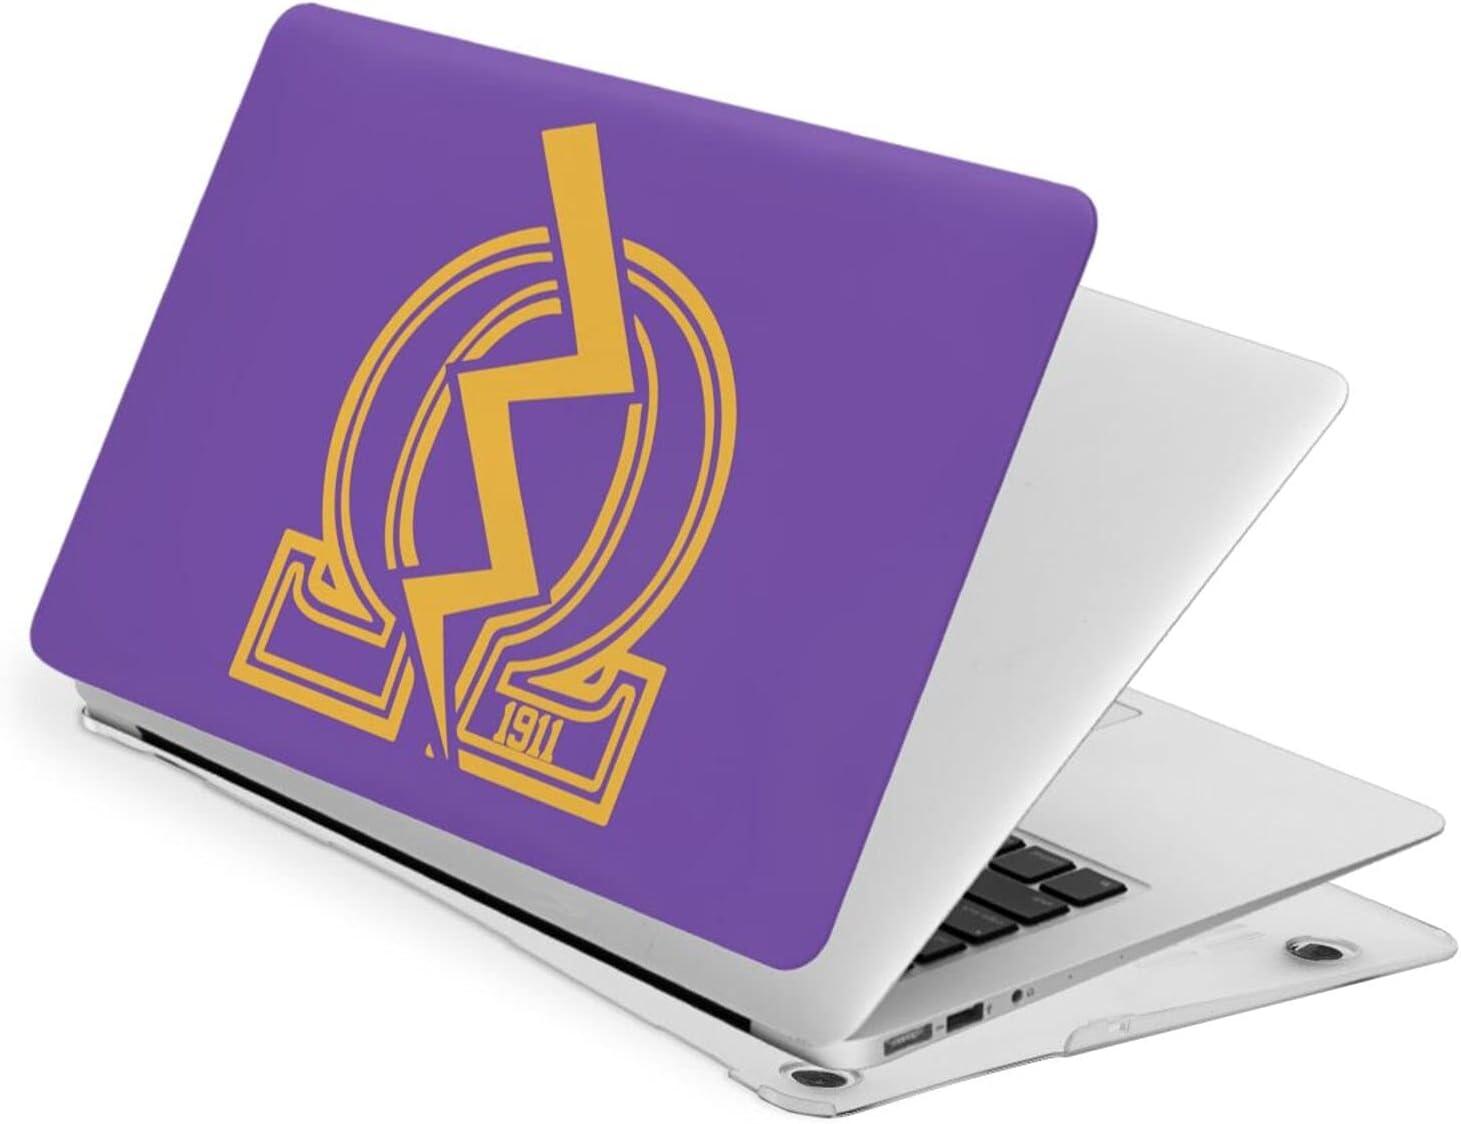 ZHUOBAIL Om-e_g-a P_s_i Ultra-Cheap Deals Fashion P-hi 1911 Fraternity Cas MacBook OPP Pro